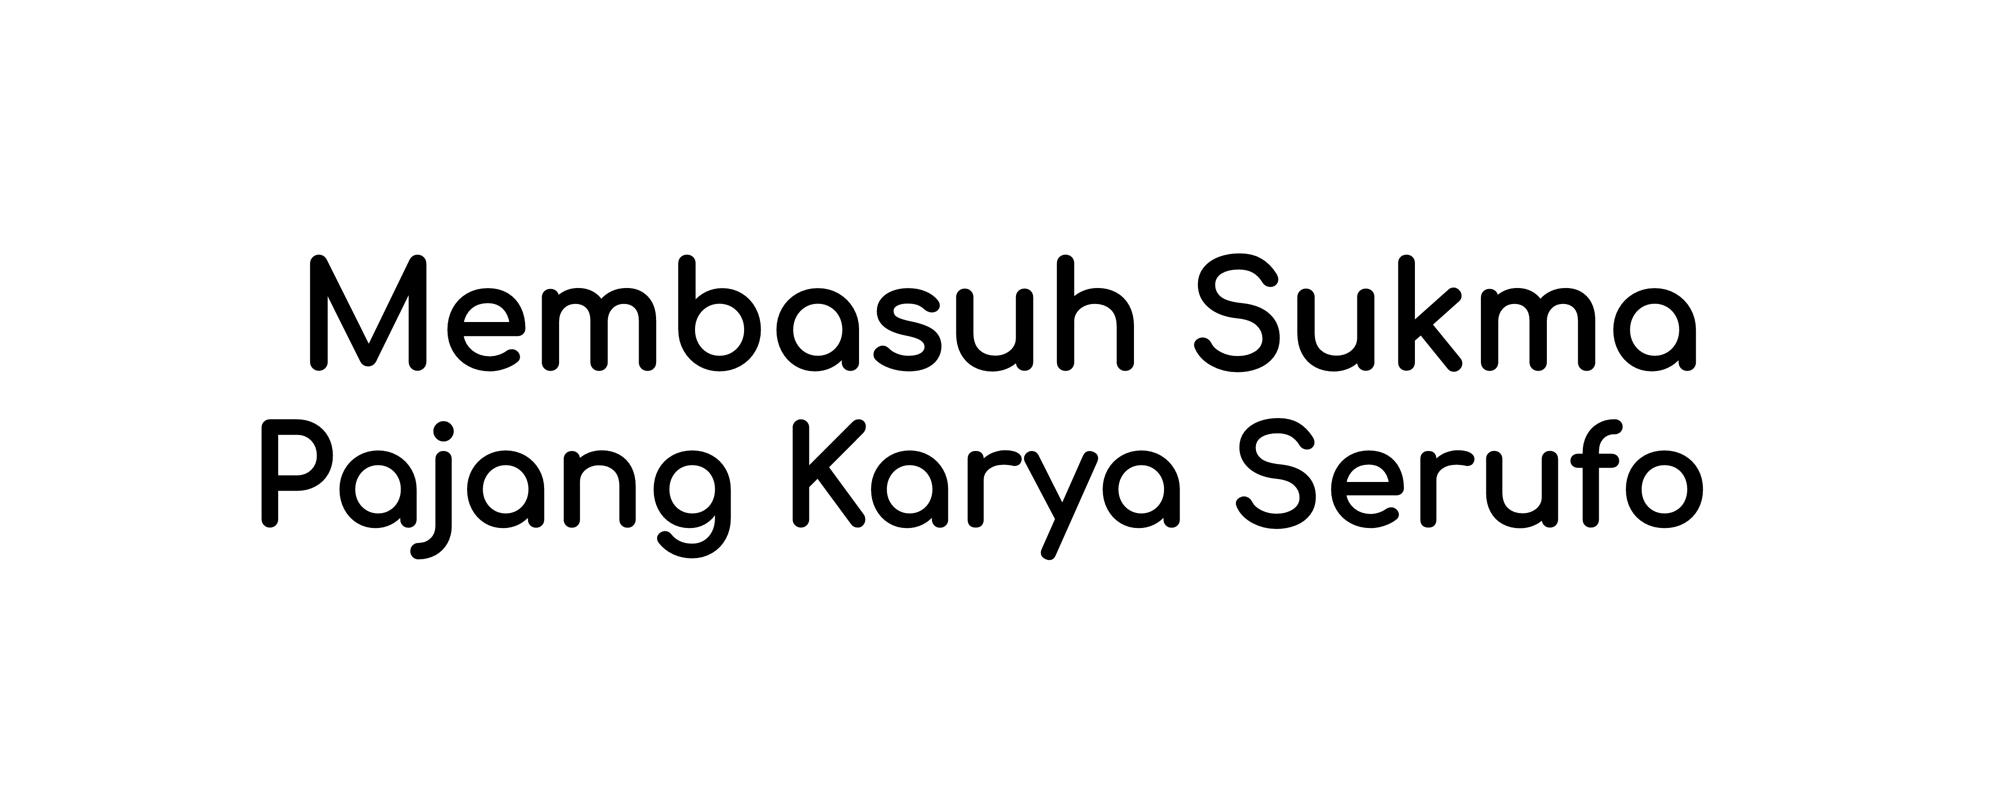 Vote Pajang Karya Membasuh Sukma Serufo UNY